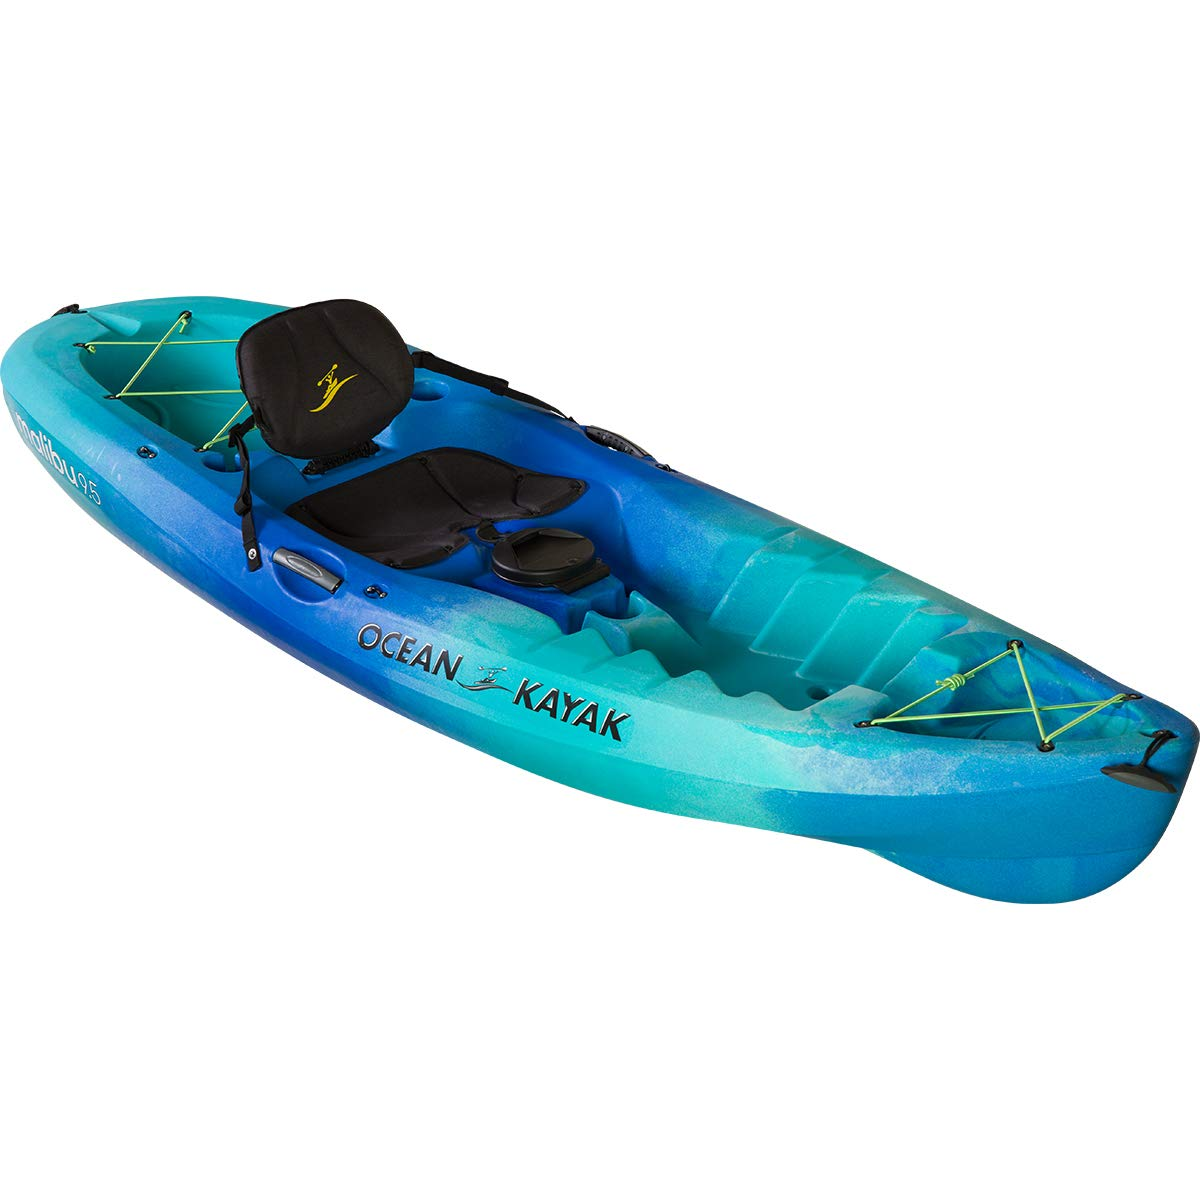 Ocean Kayak Malibu 9.5 Kayak (Seaglass, 9 Feet 5 Inches) by Ocean Kayak